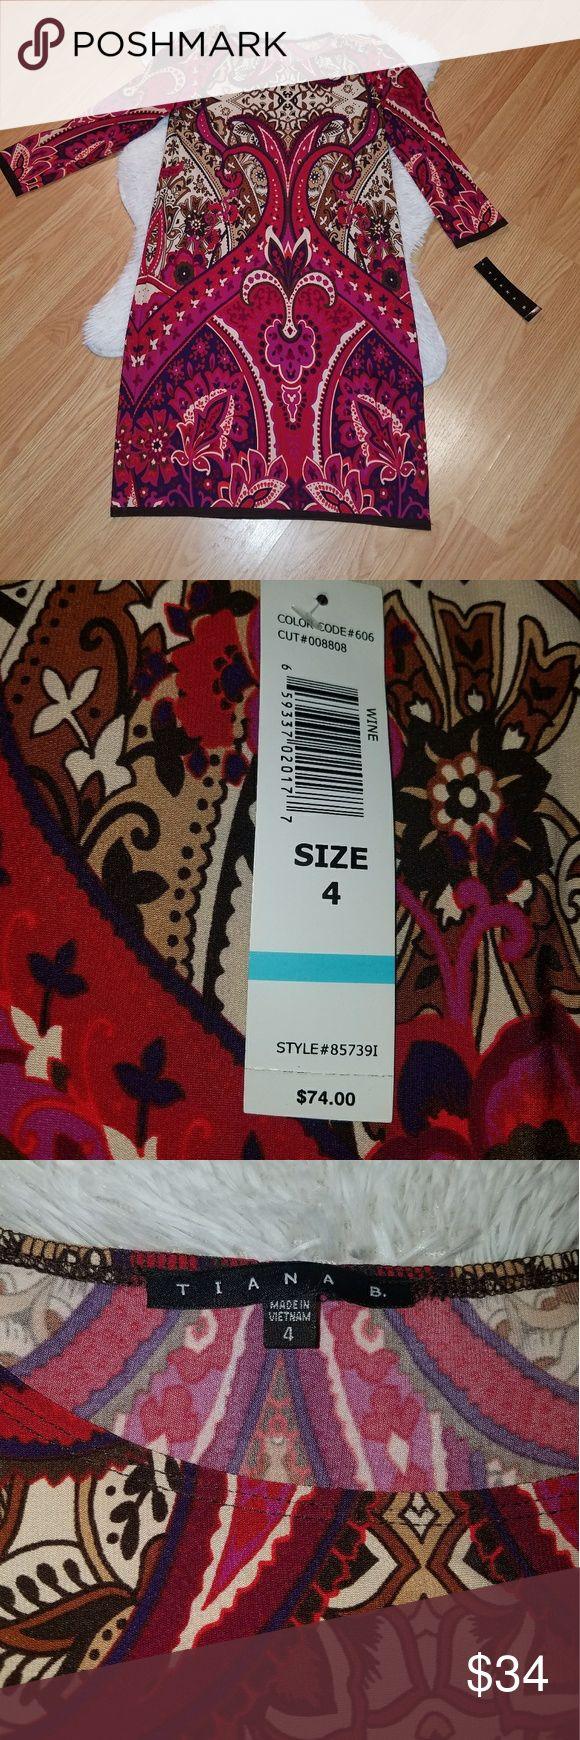 I just added this listing on Poshmark: NWT Tiana B. Dress Size 4 Red Purple Tan Brown. #shopmycloset #poshmark #fashion #shopping #style #forsale #Tiana B #Dresses & Skirts